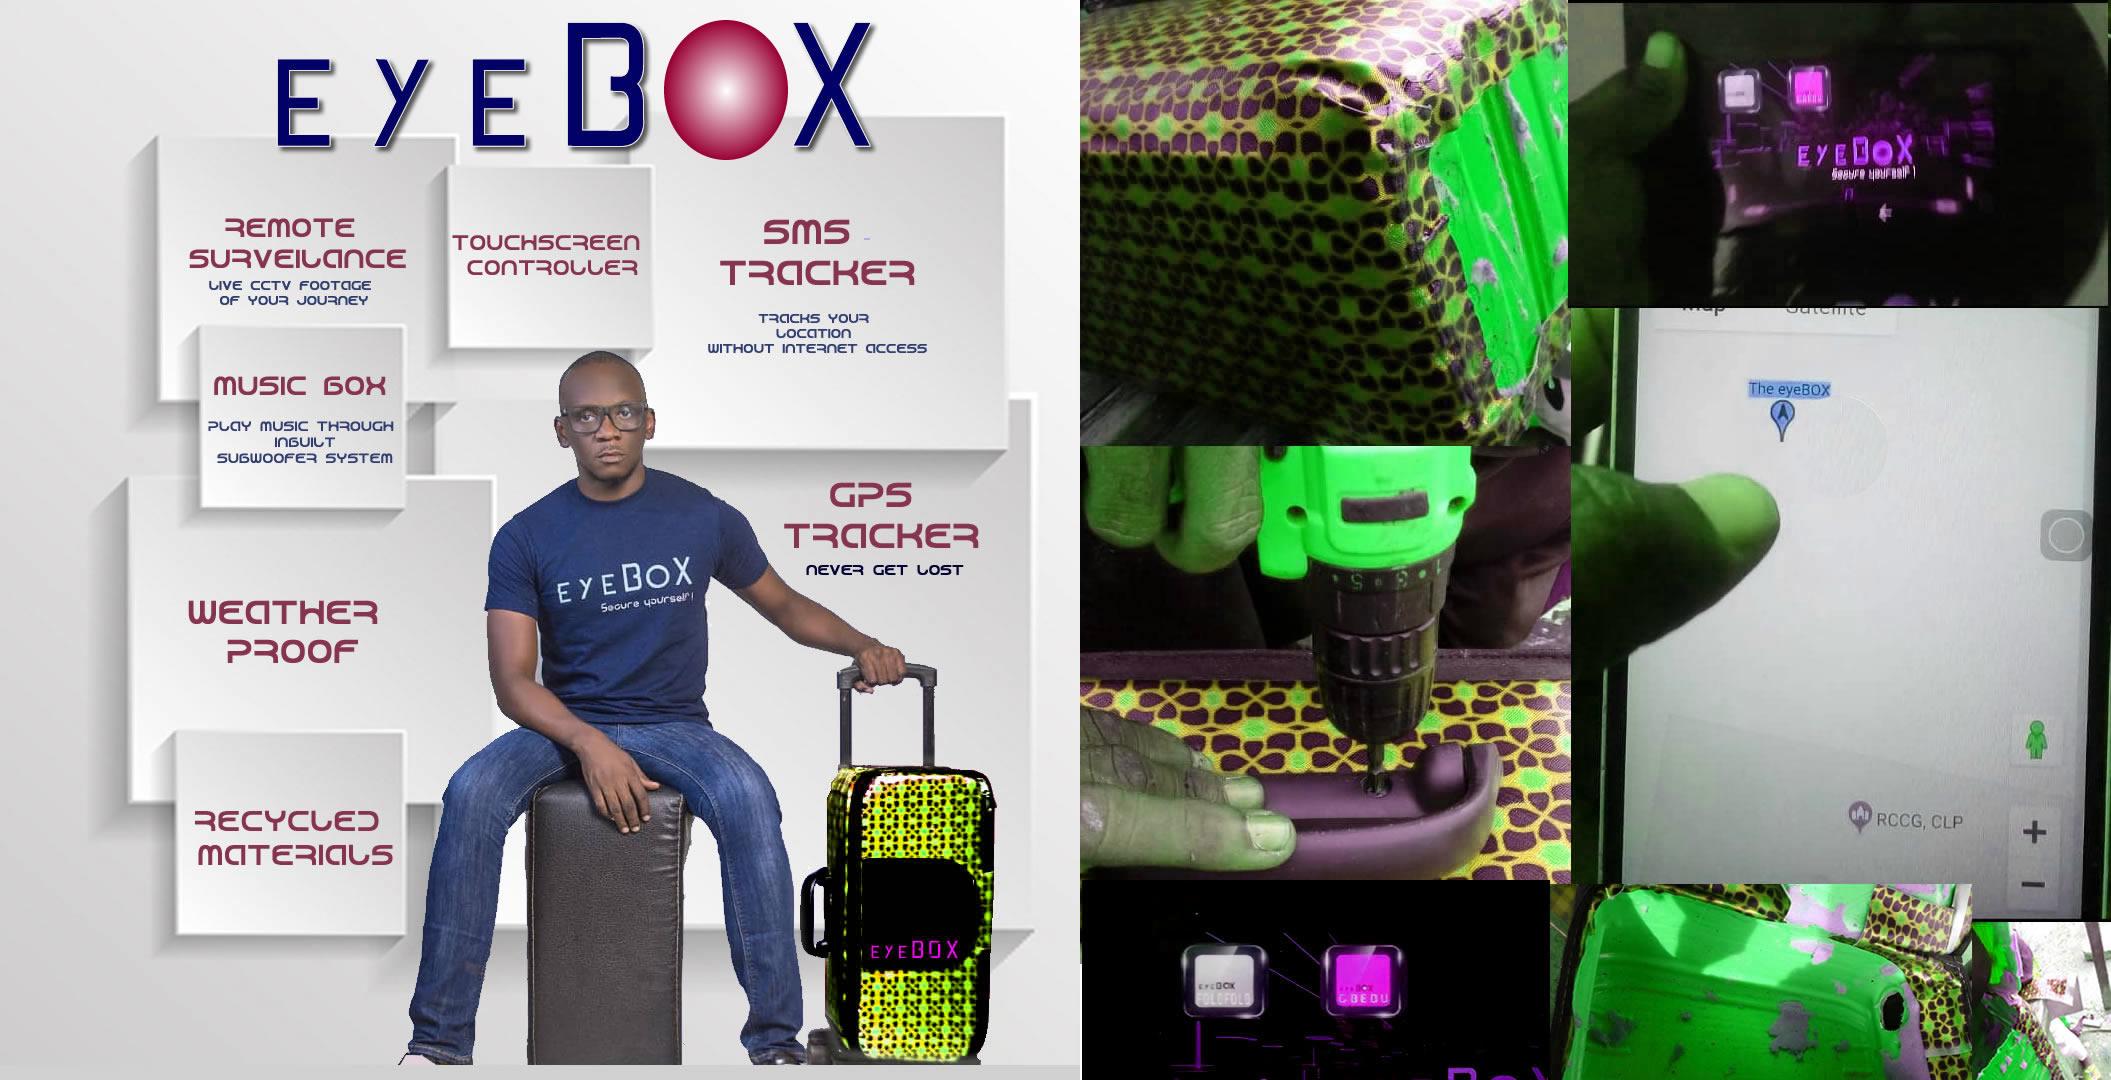 EyeBox